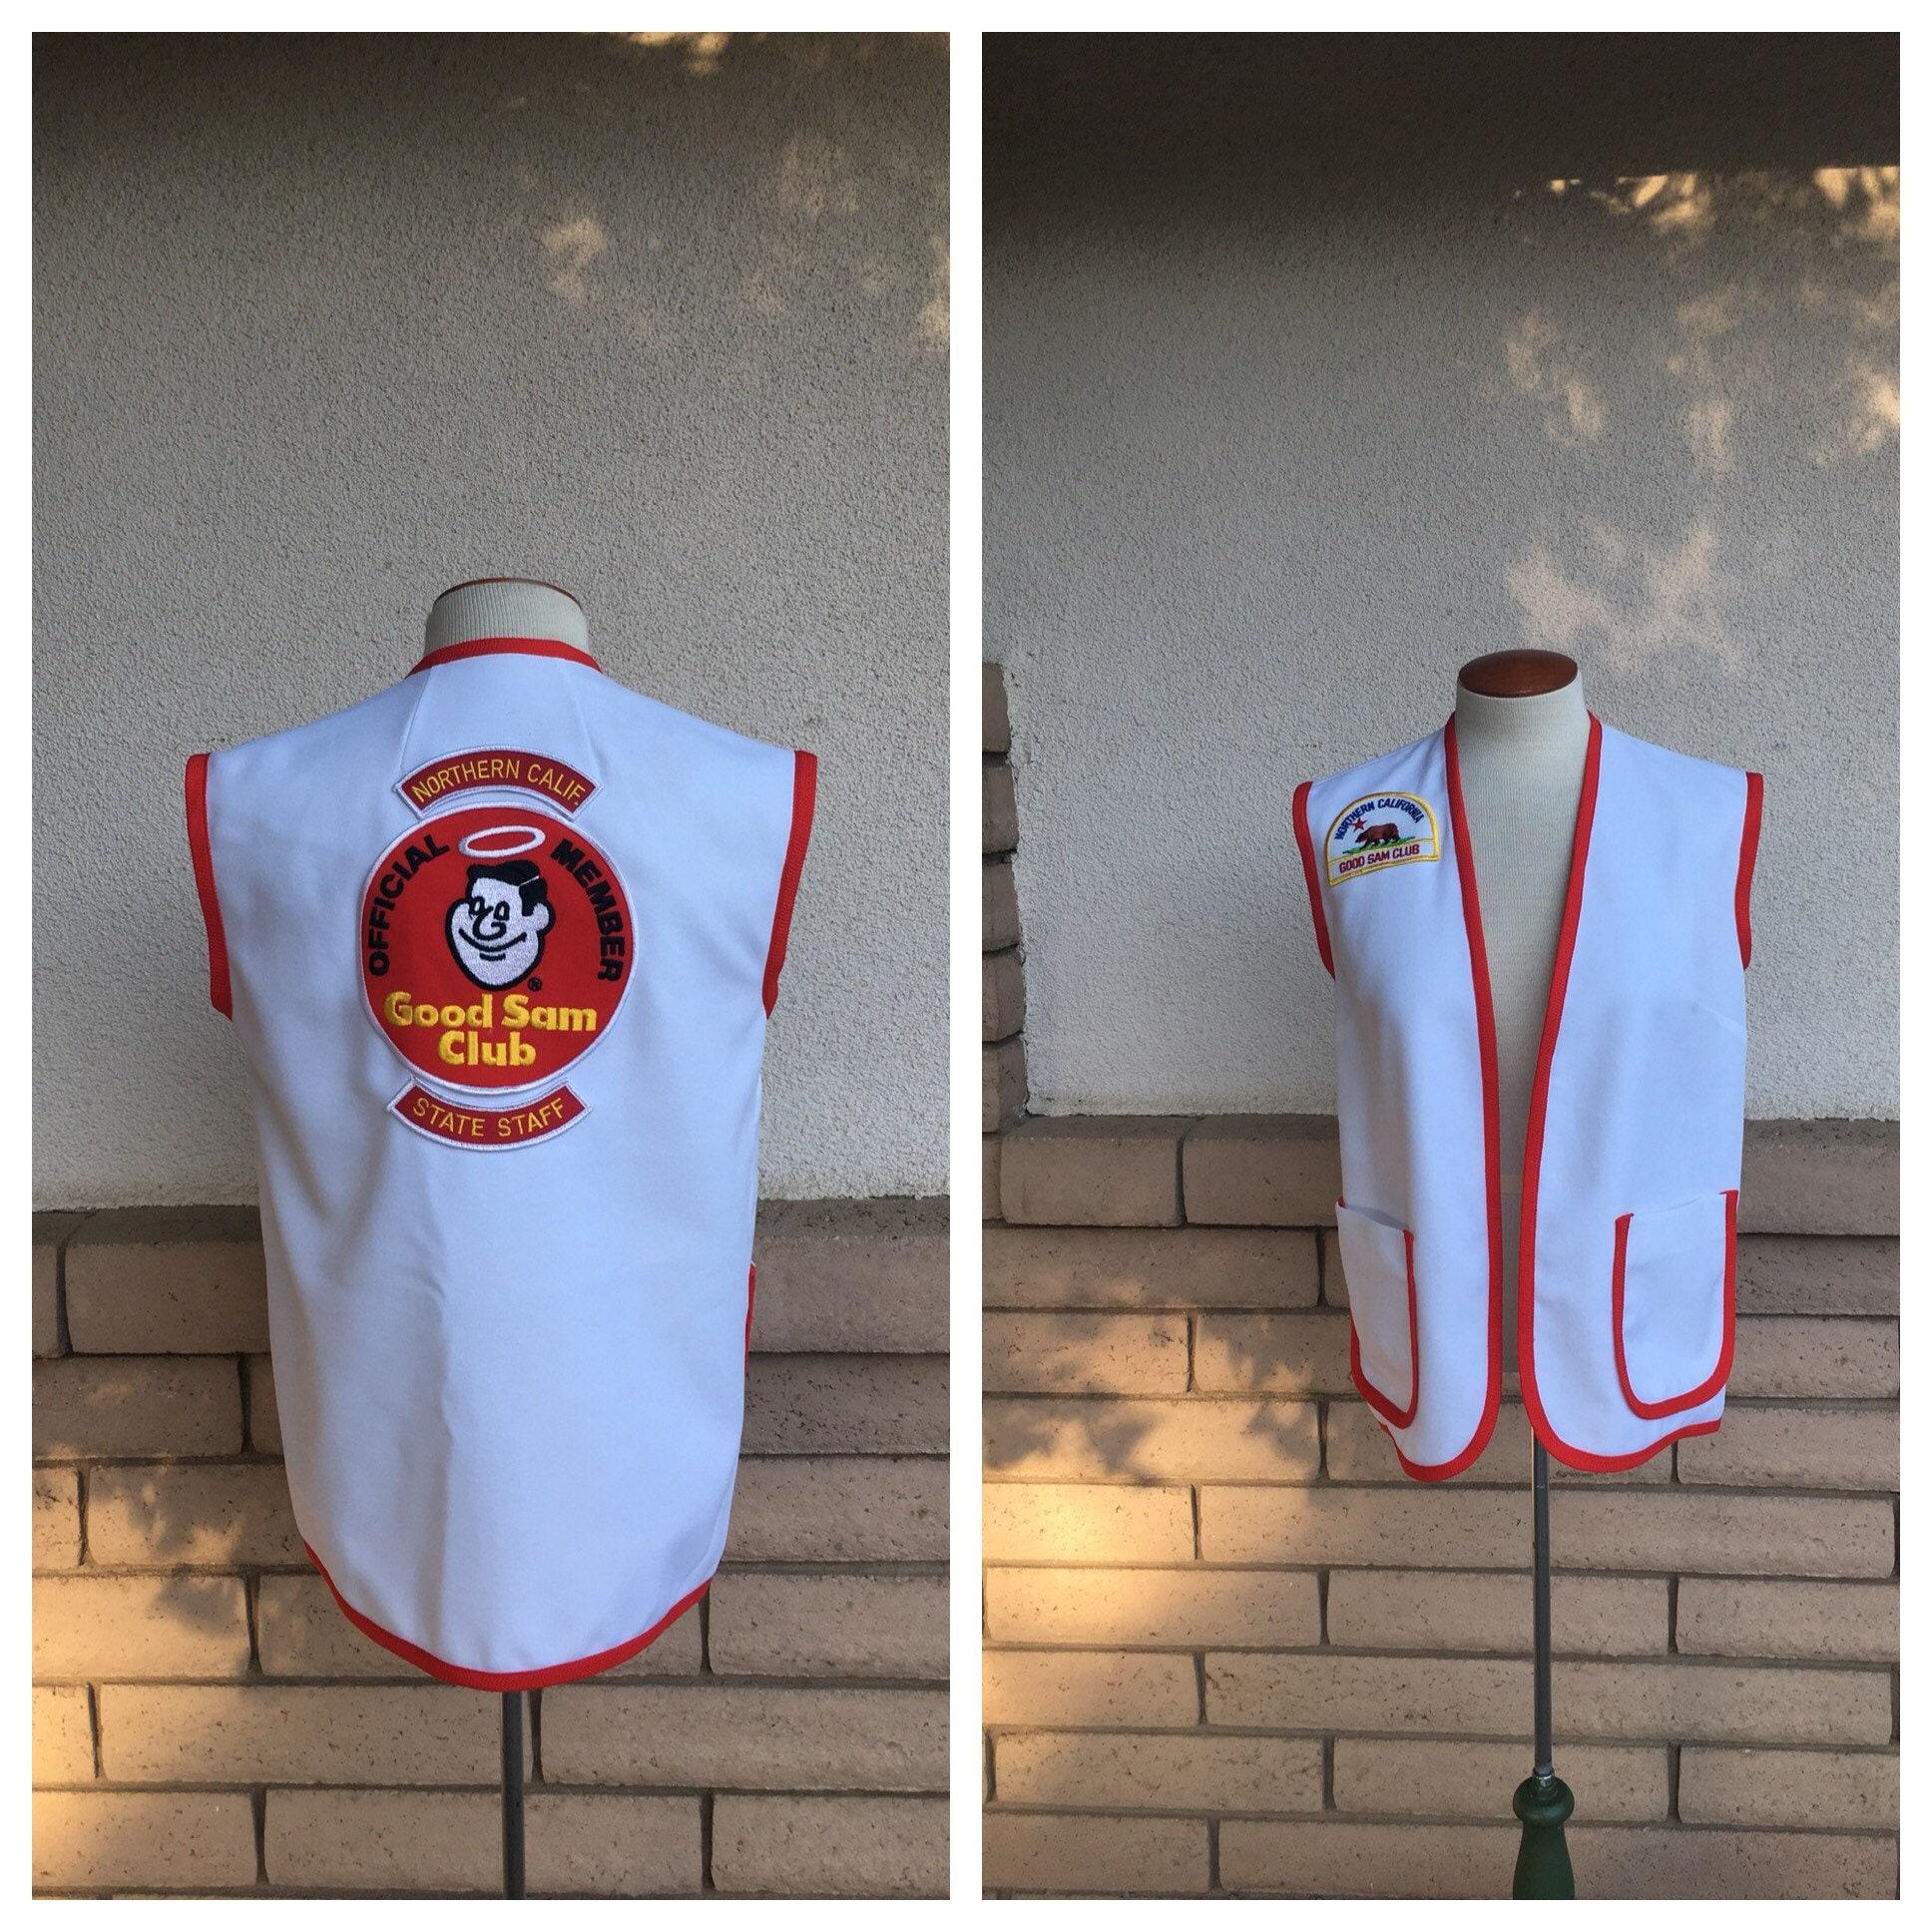 Vintage Official Good Sam Club Staff Shirt Vest RV Camping Northern  California Travel Uniform Women Men Small Medium Large